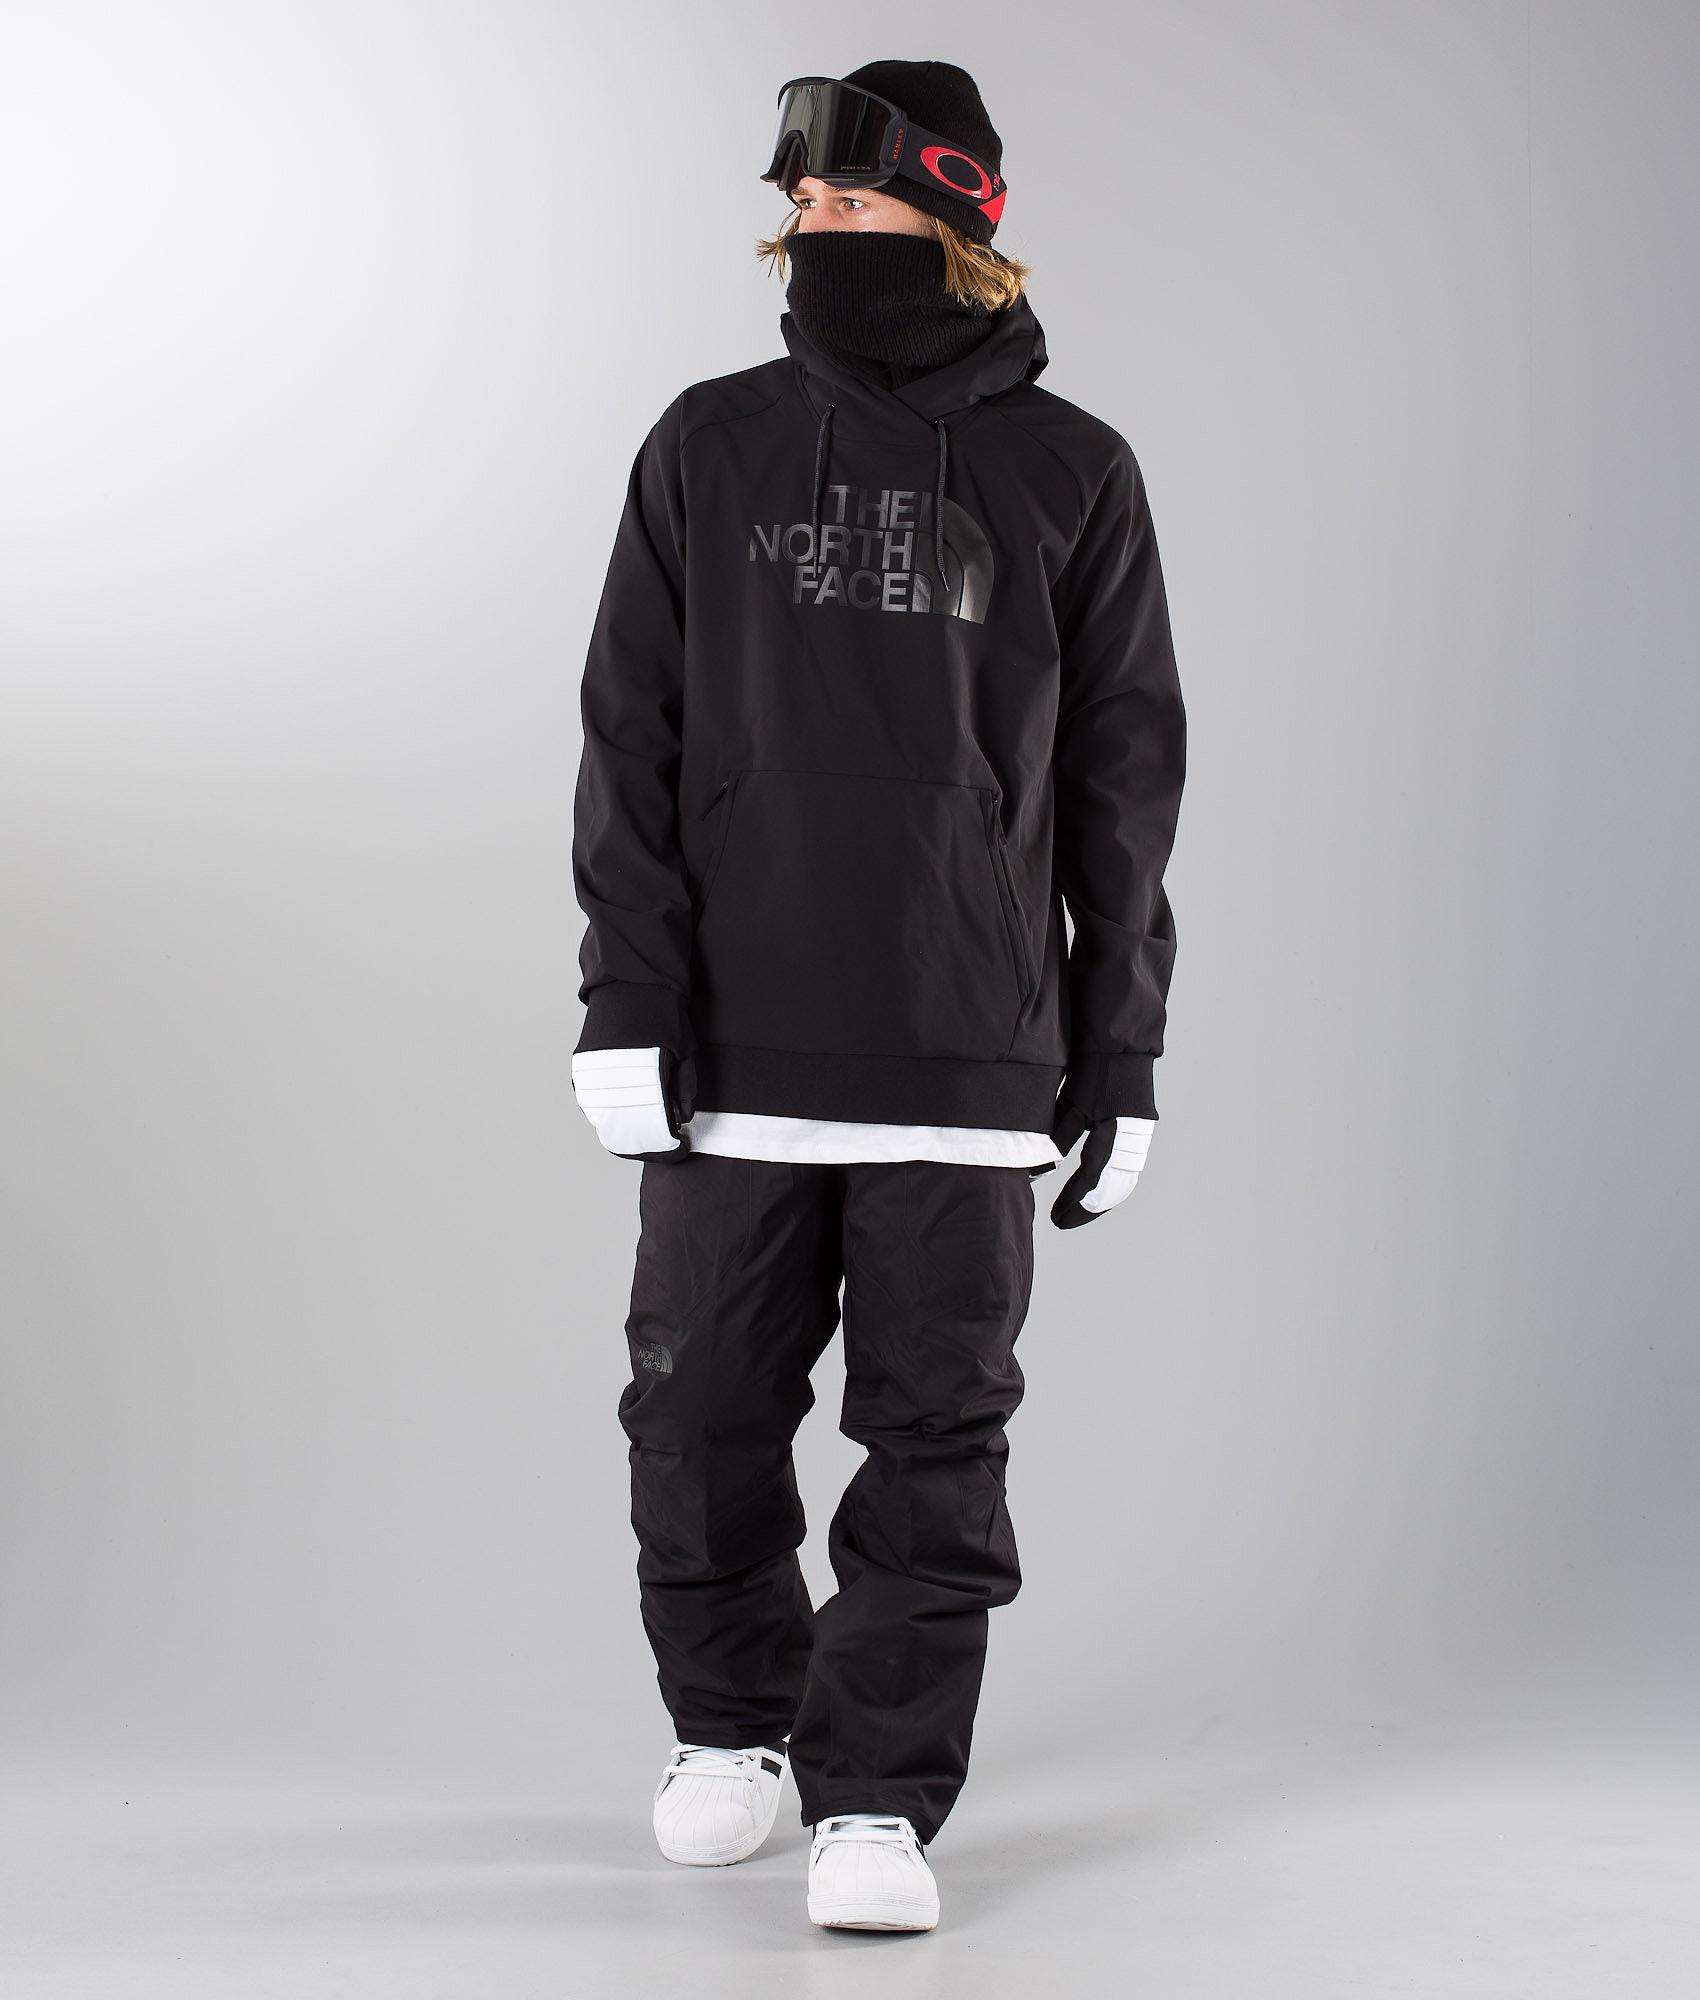 The North Face Tekno Logo Hoodie Snowboard Jacket Black - Ridestore.com 31b5c77ea